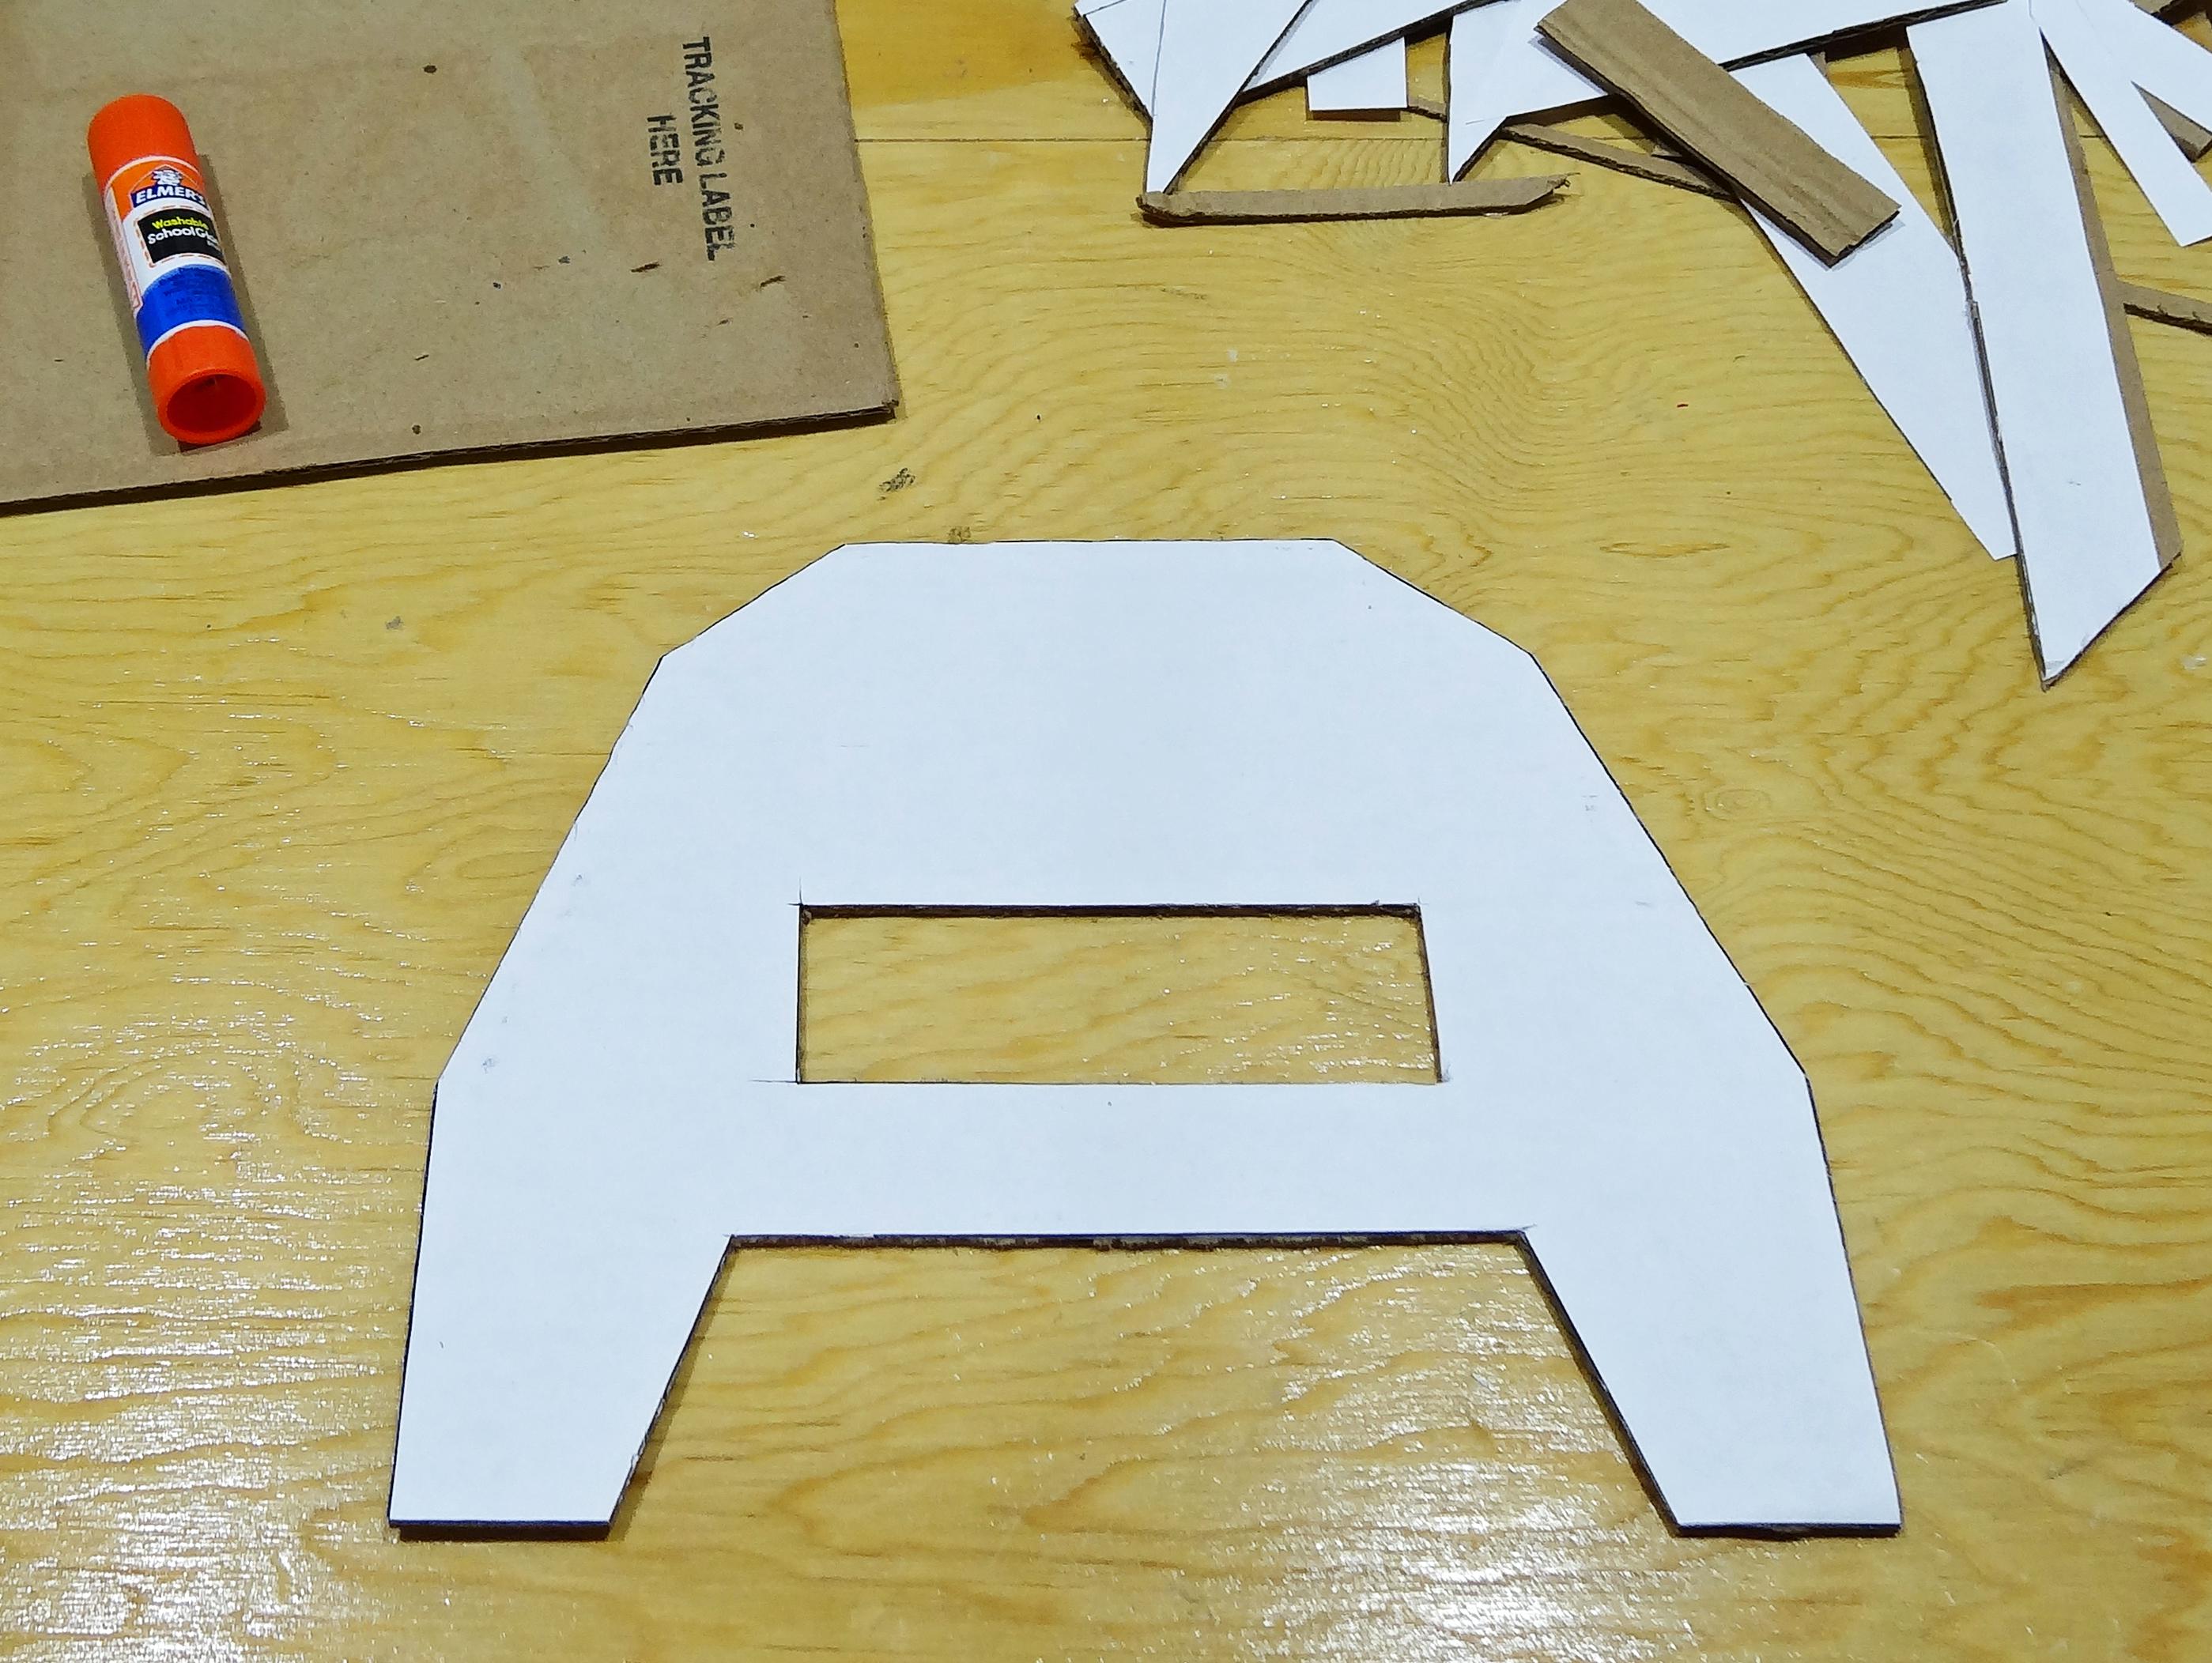 adafruit_products_attach_template_05.jpg